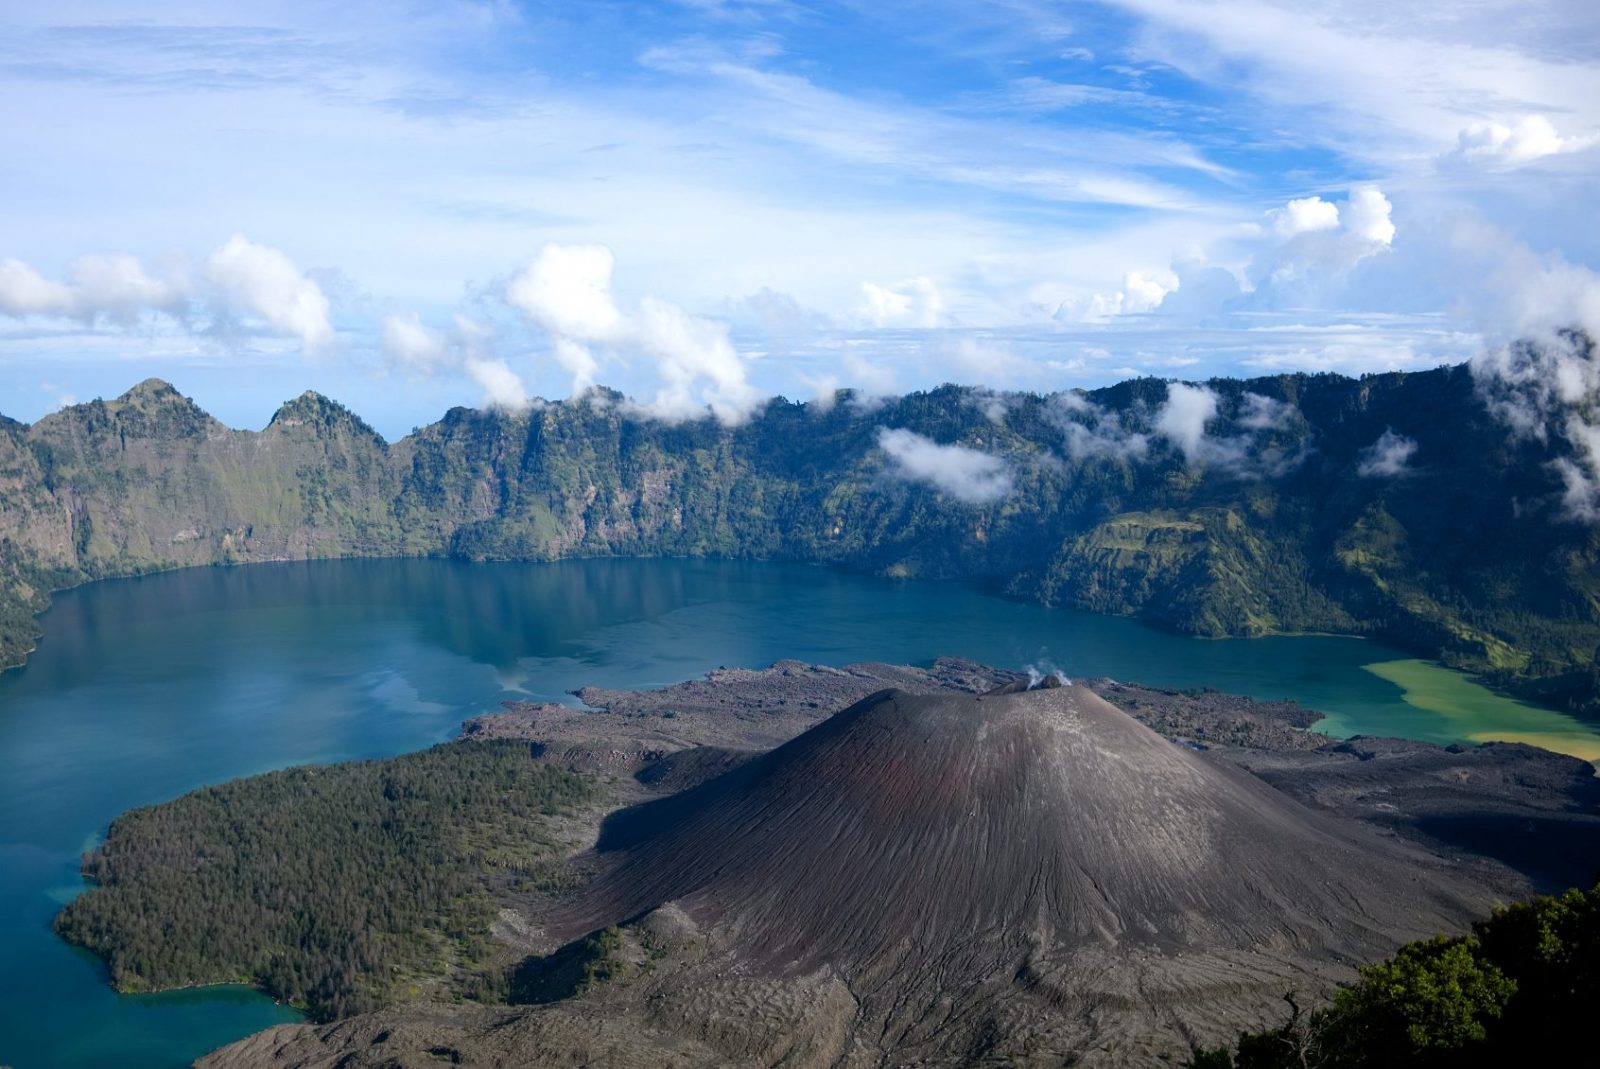 Вулкан Ринжани, Ломбок, Индонезия